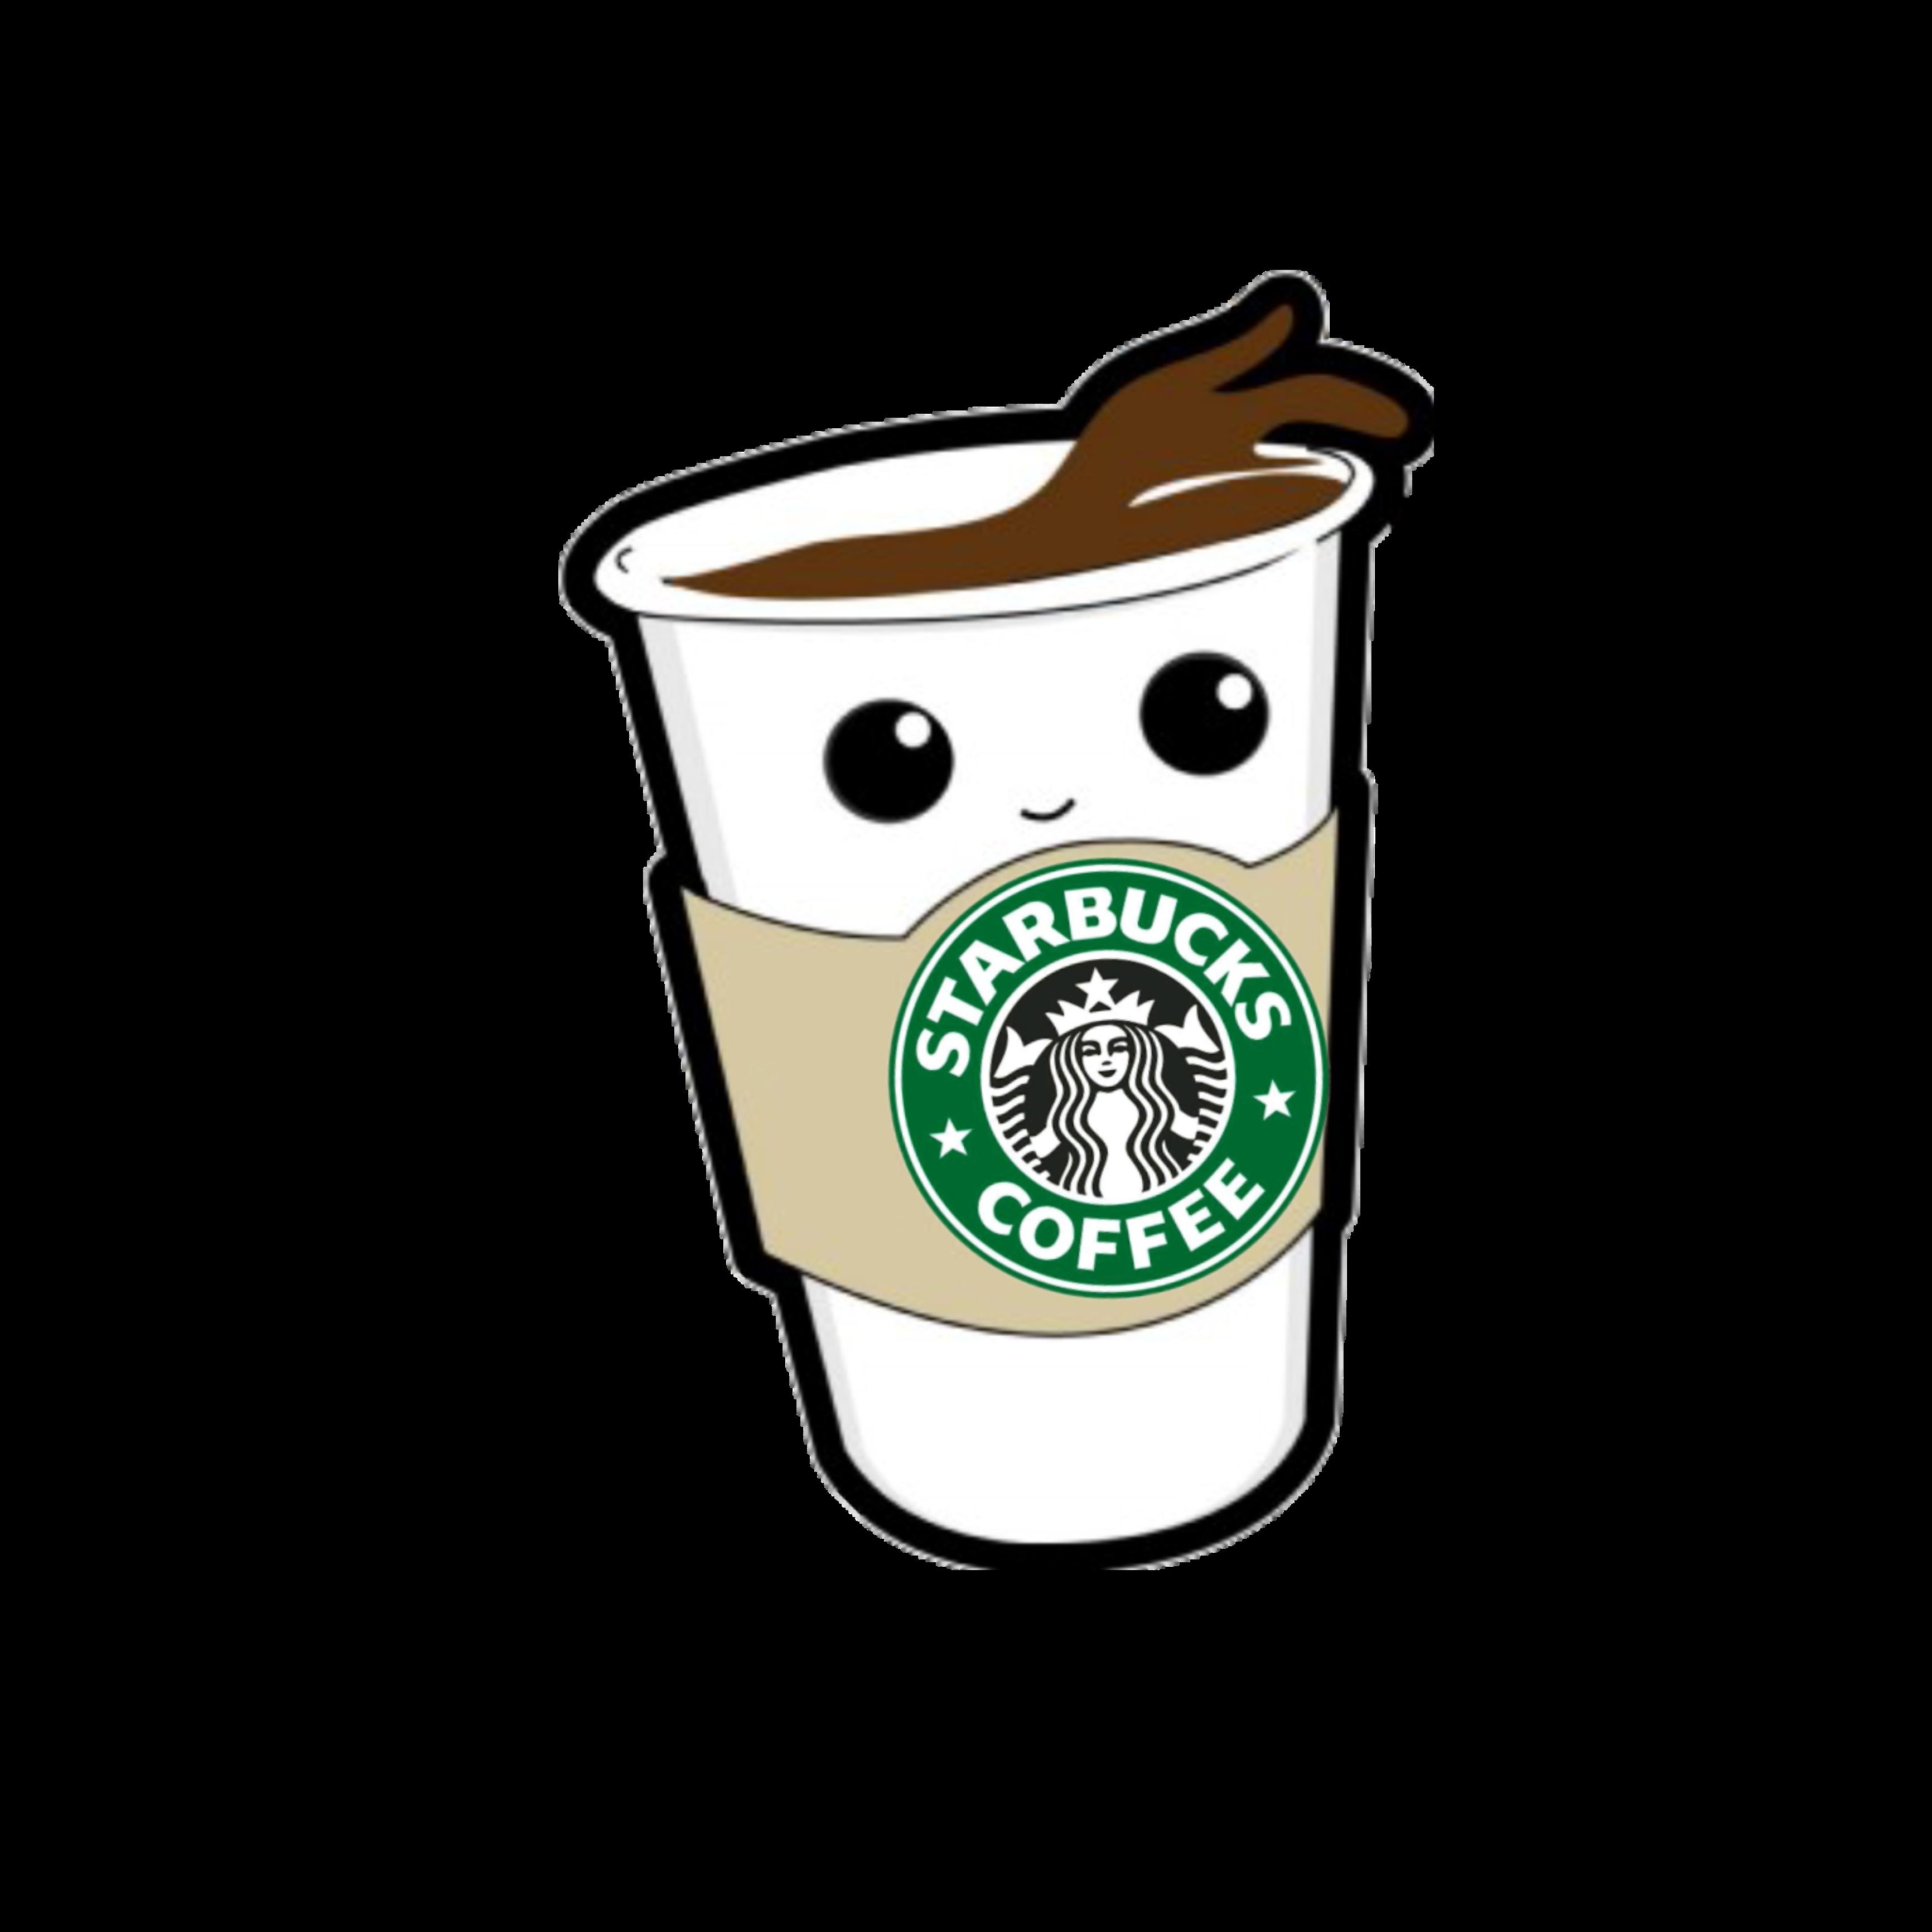 Кофе старбакс рисунки